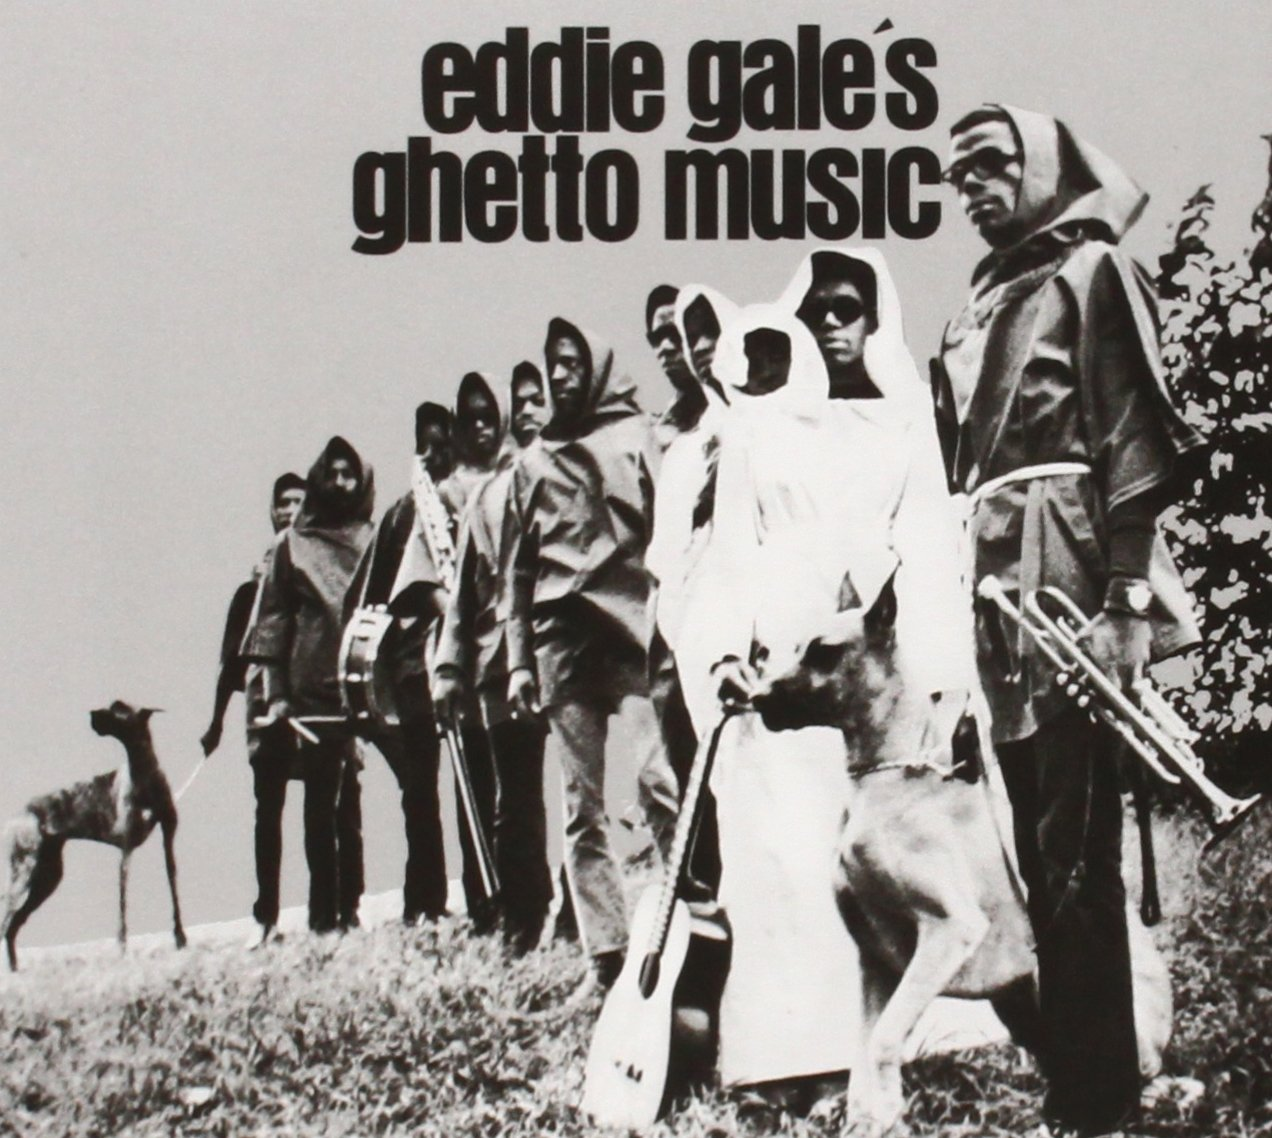 Eddie Gale's Ghetto Music: Eddie Gale: Amazon.es: Música